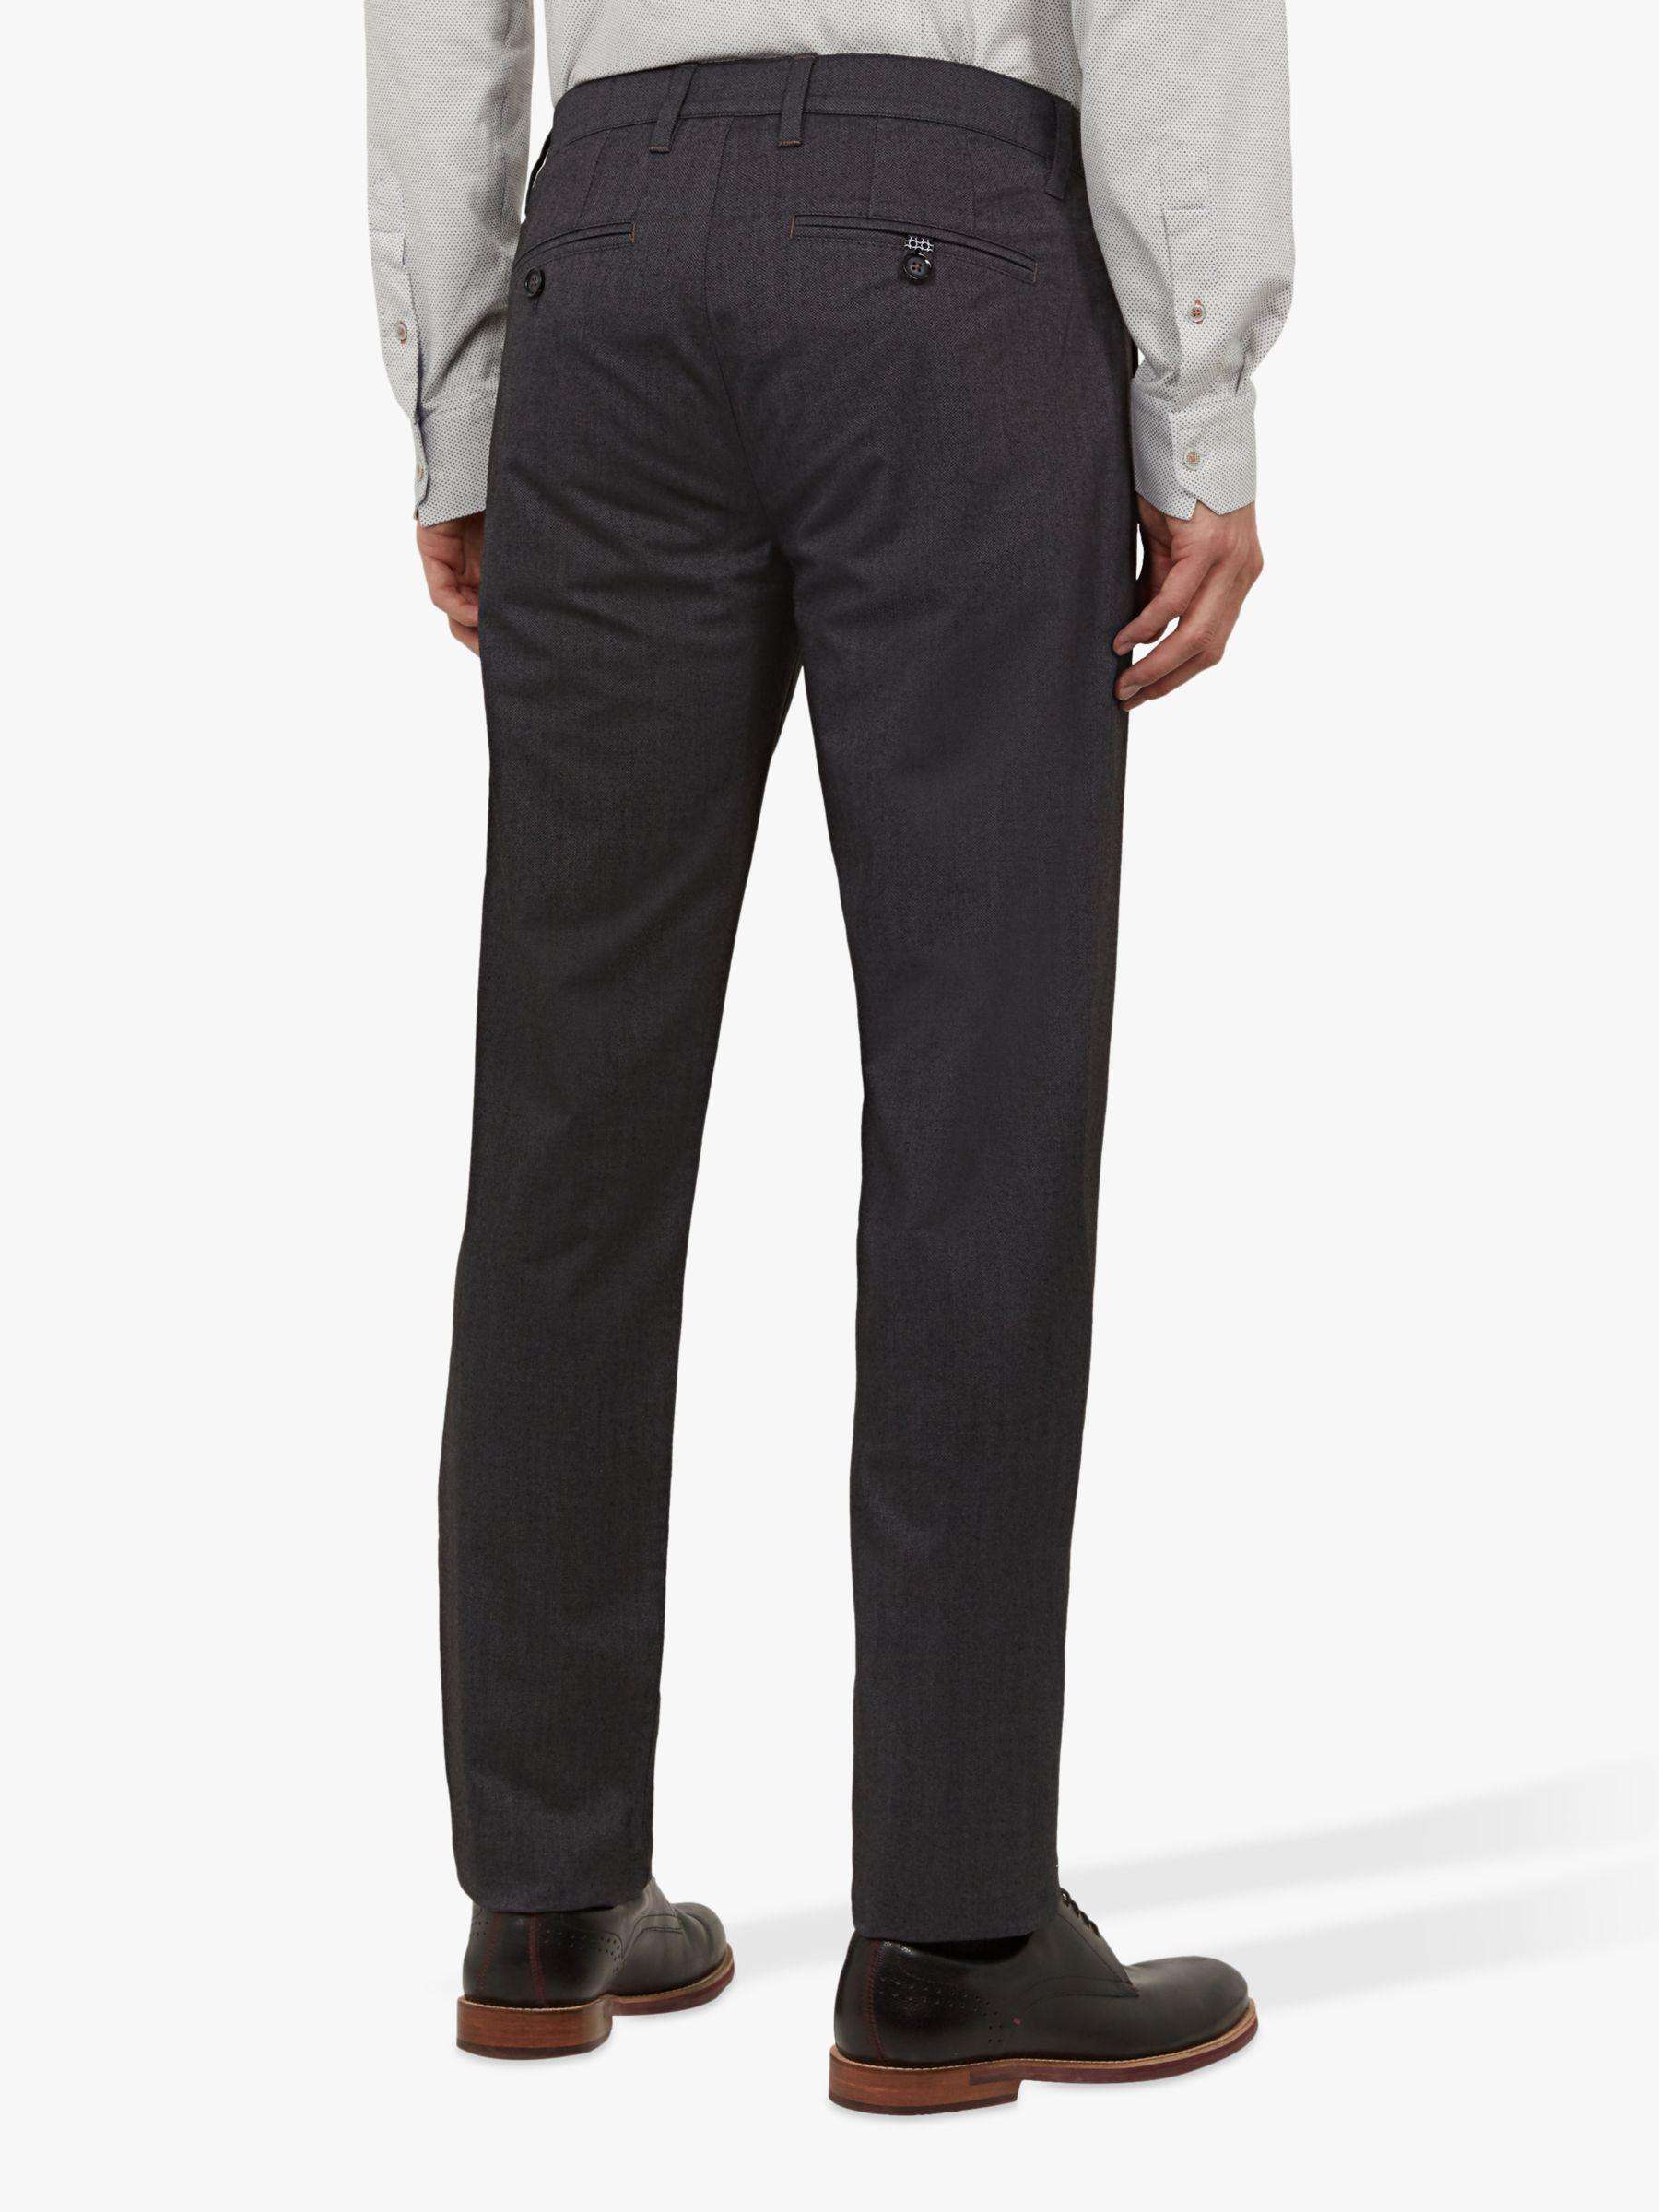 9c4ea9e7c4a ... Gray Claiel Slim Trousers for Men - Lyst. View fullscreen